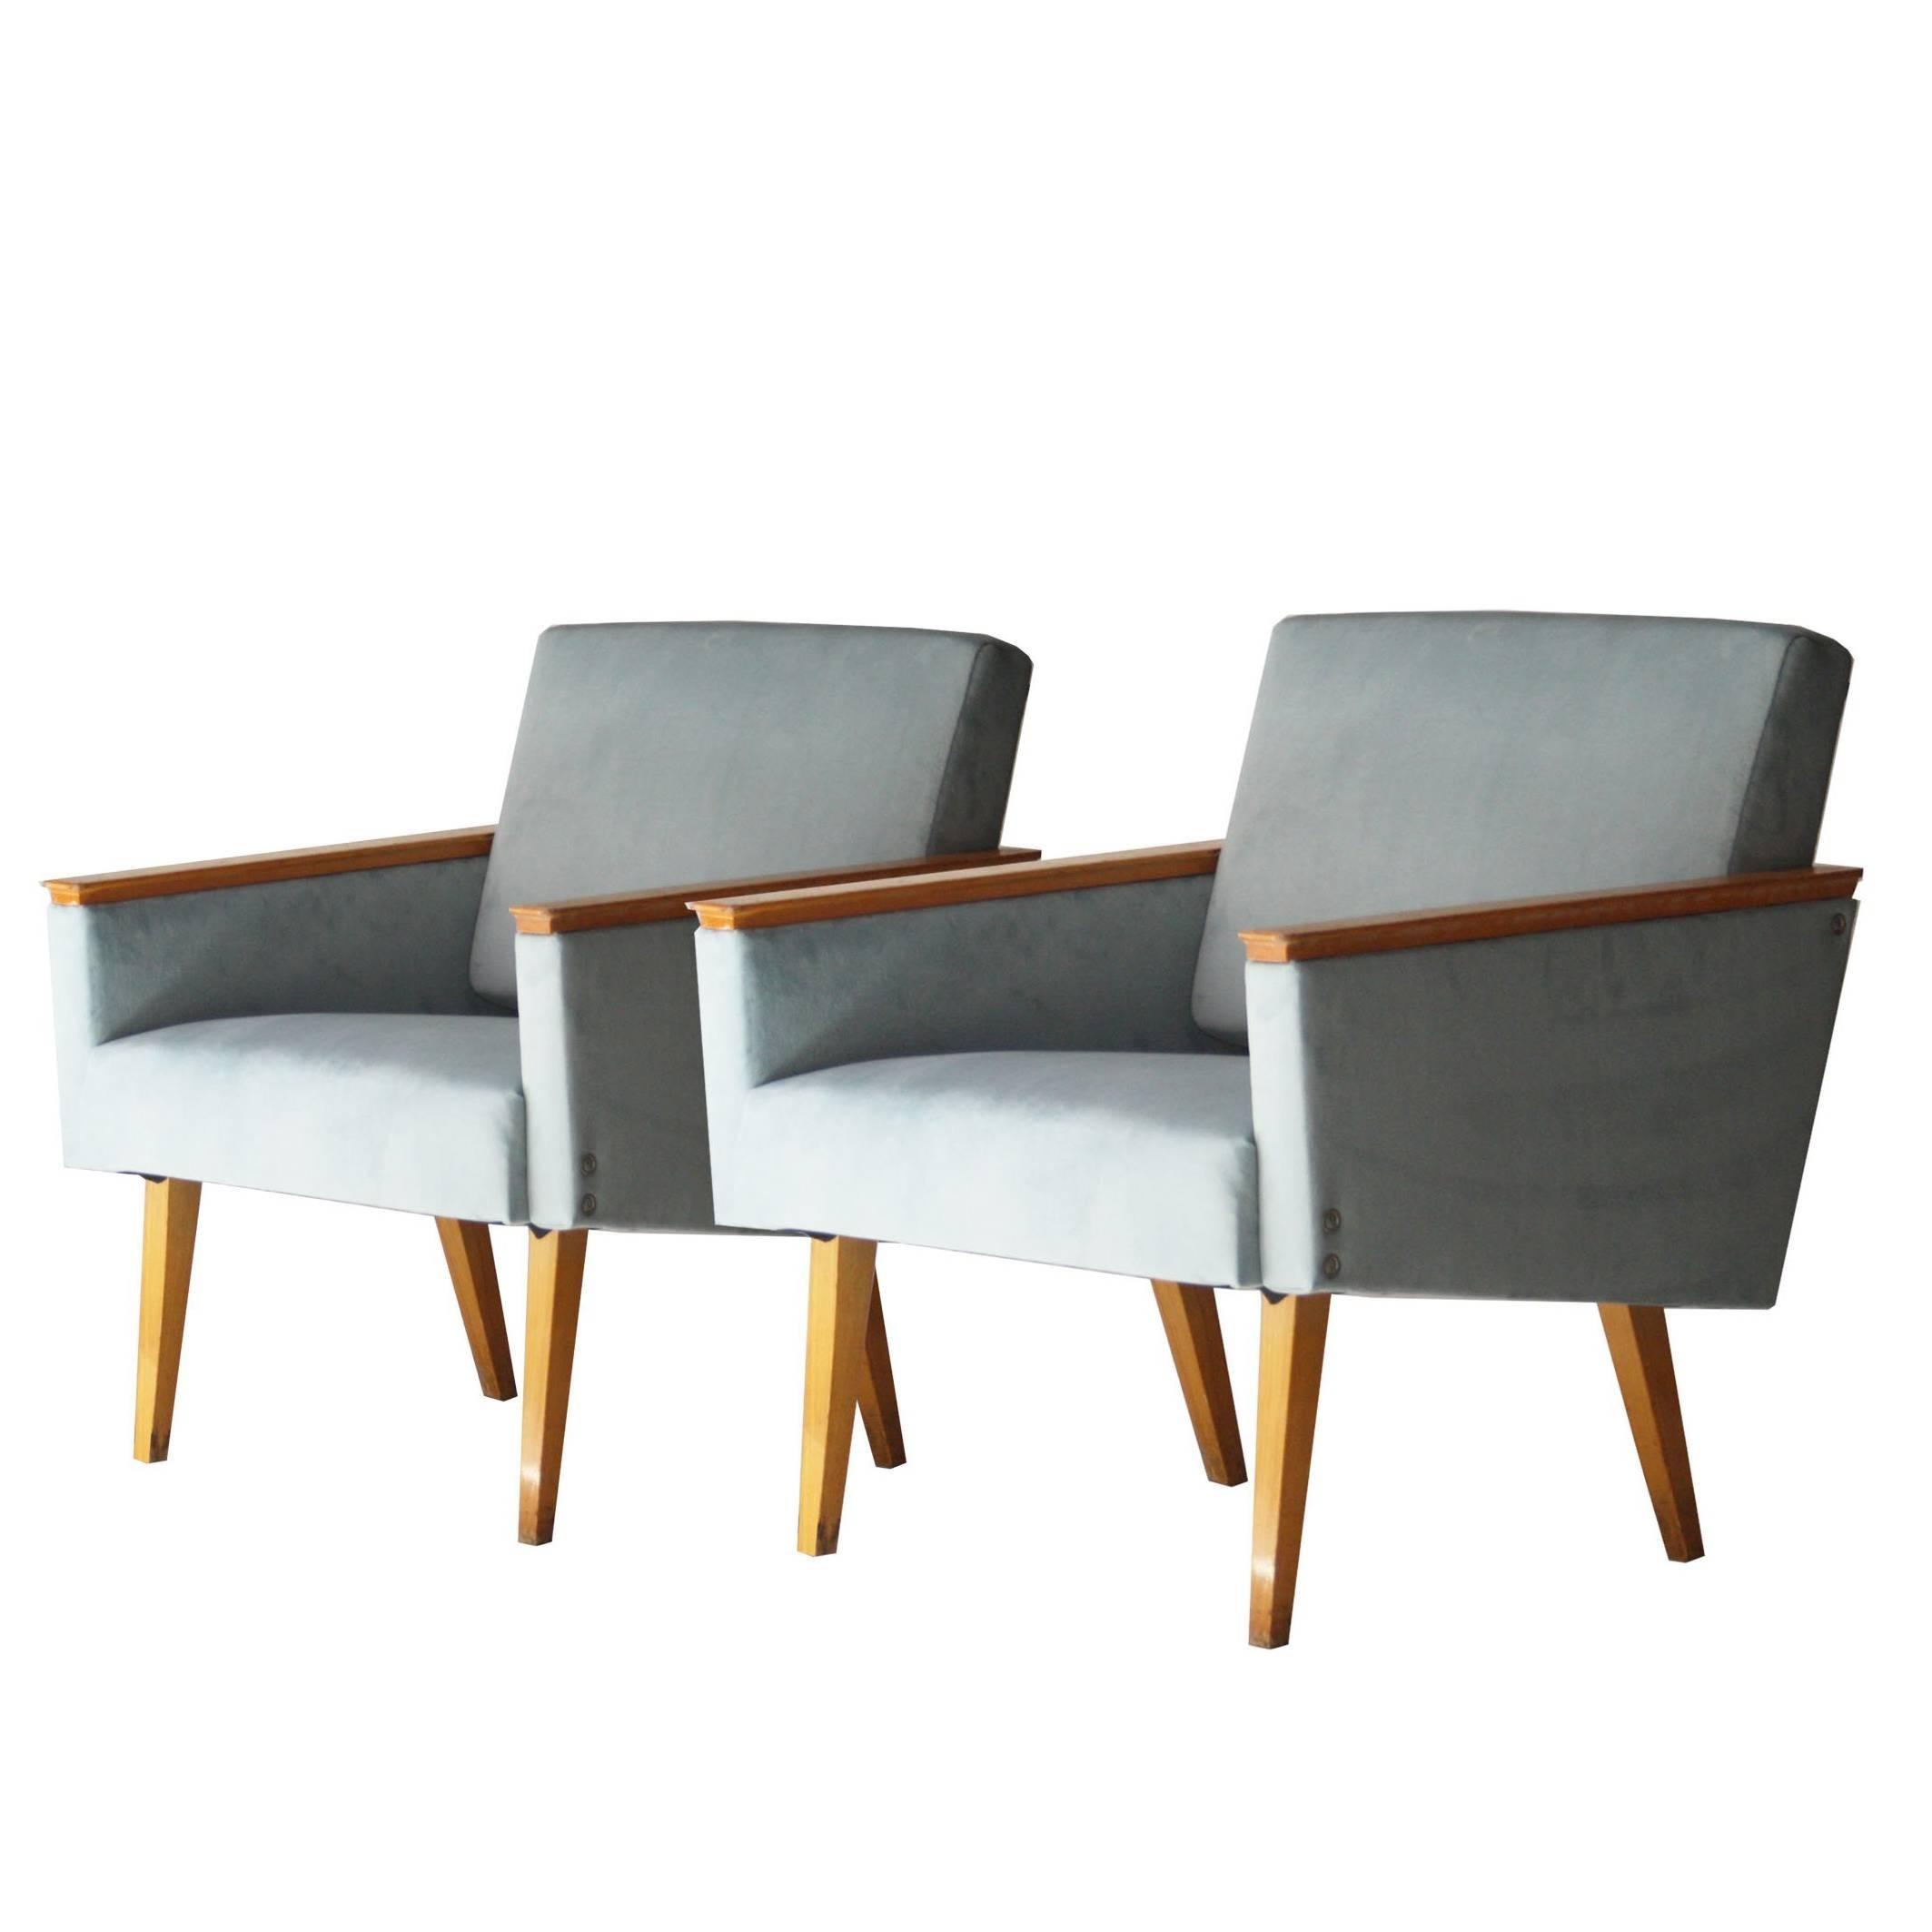 Genial Pair Of Armchairs With Velvet Upholstery. Czechoslovakia, 1960.